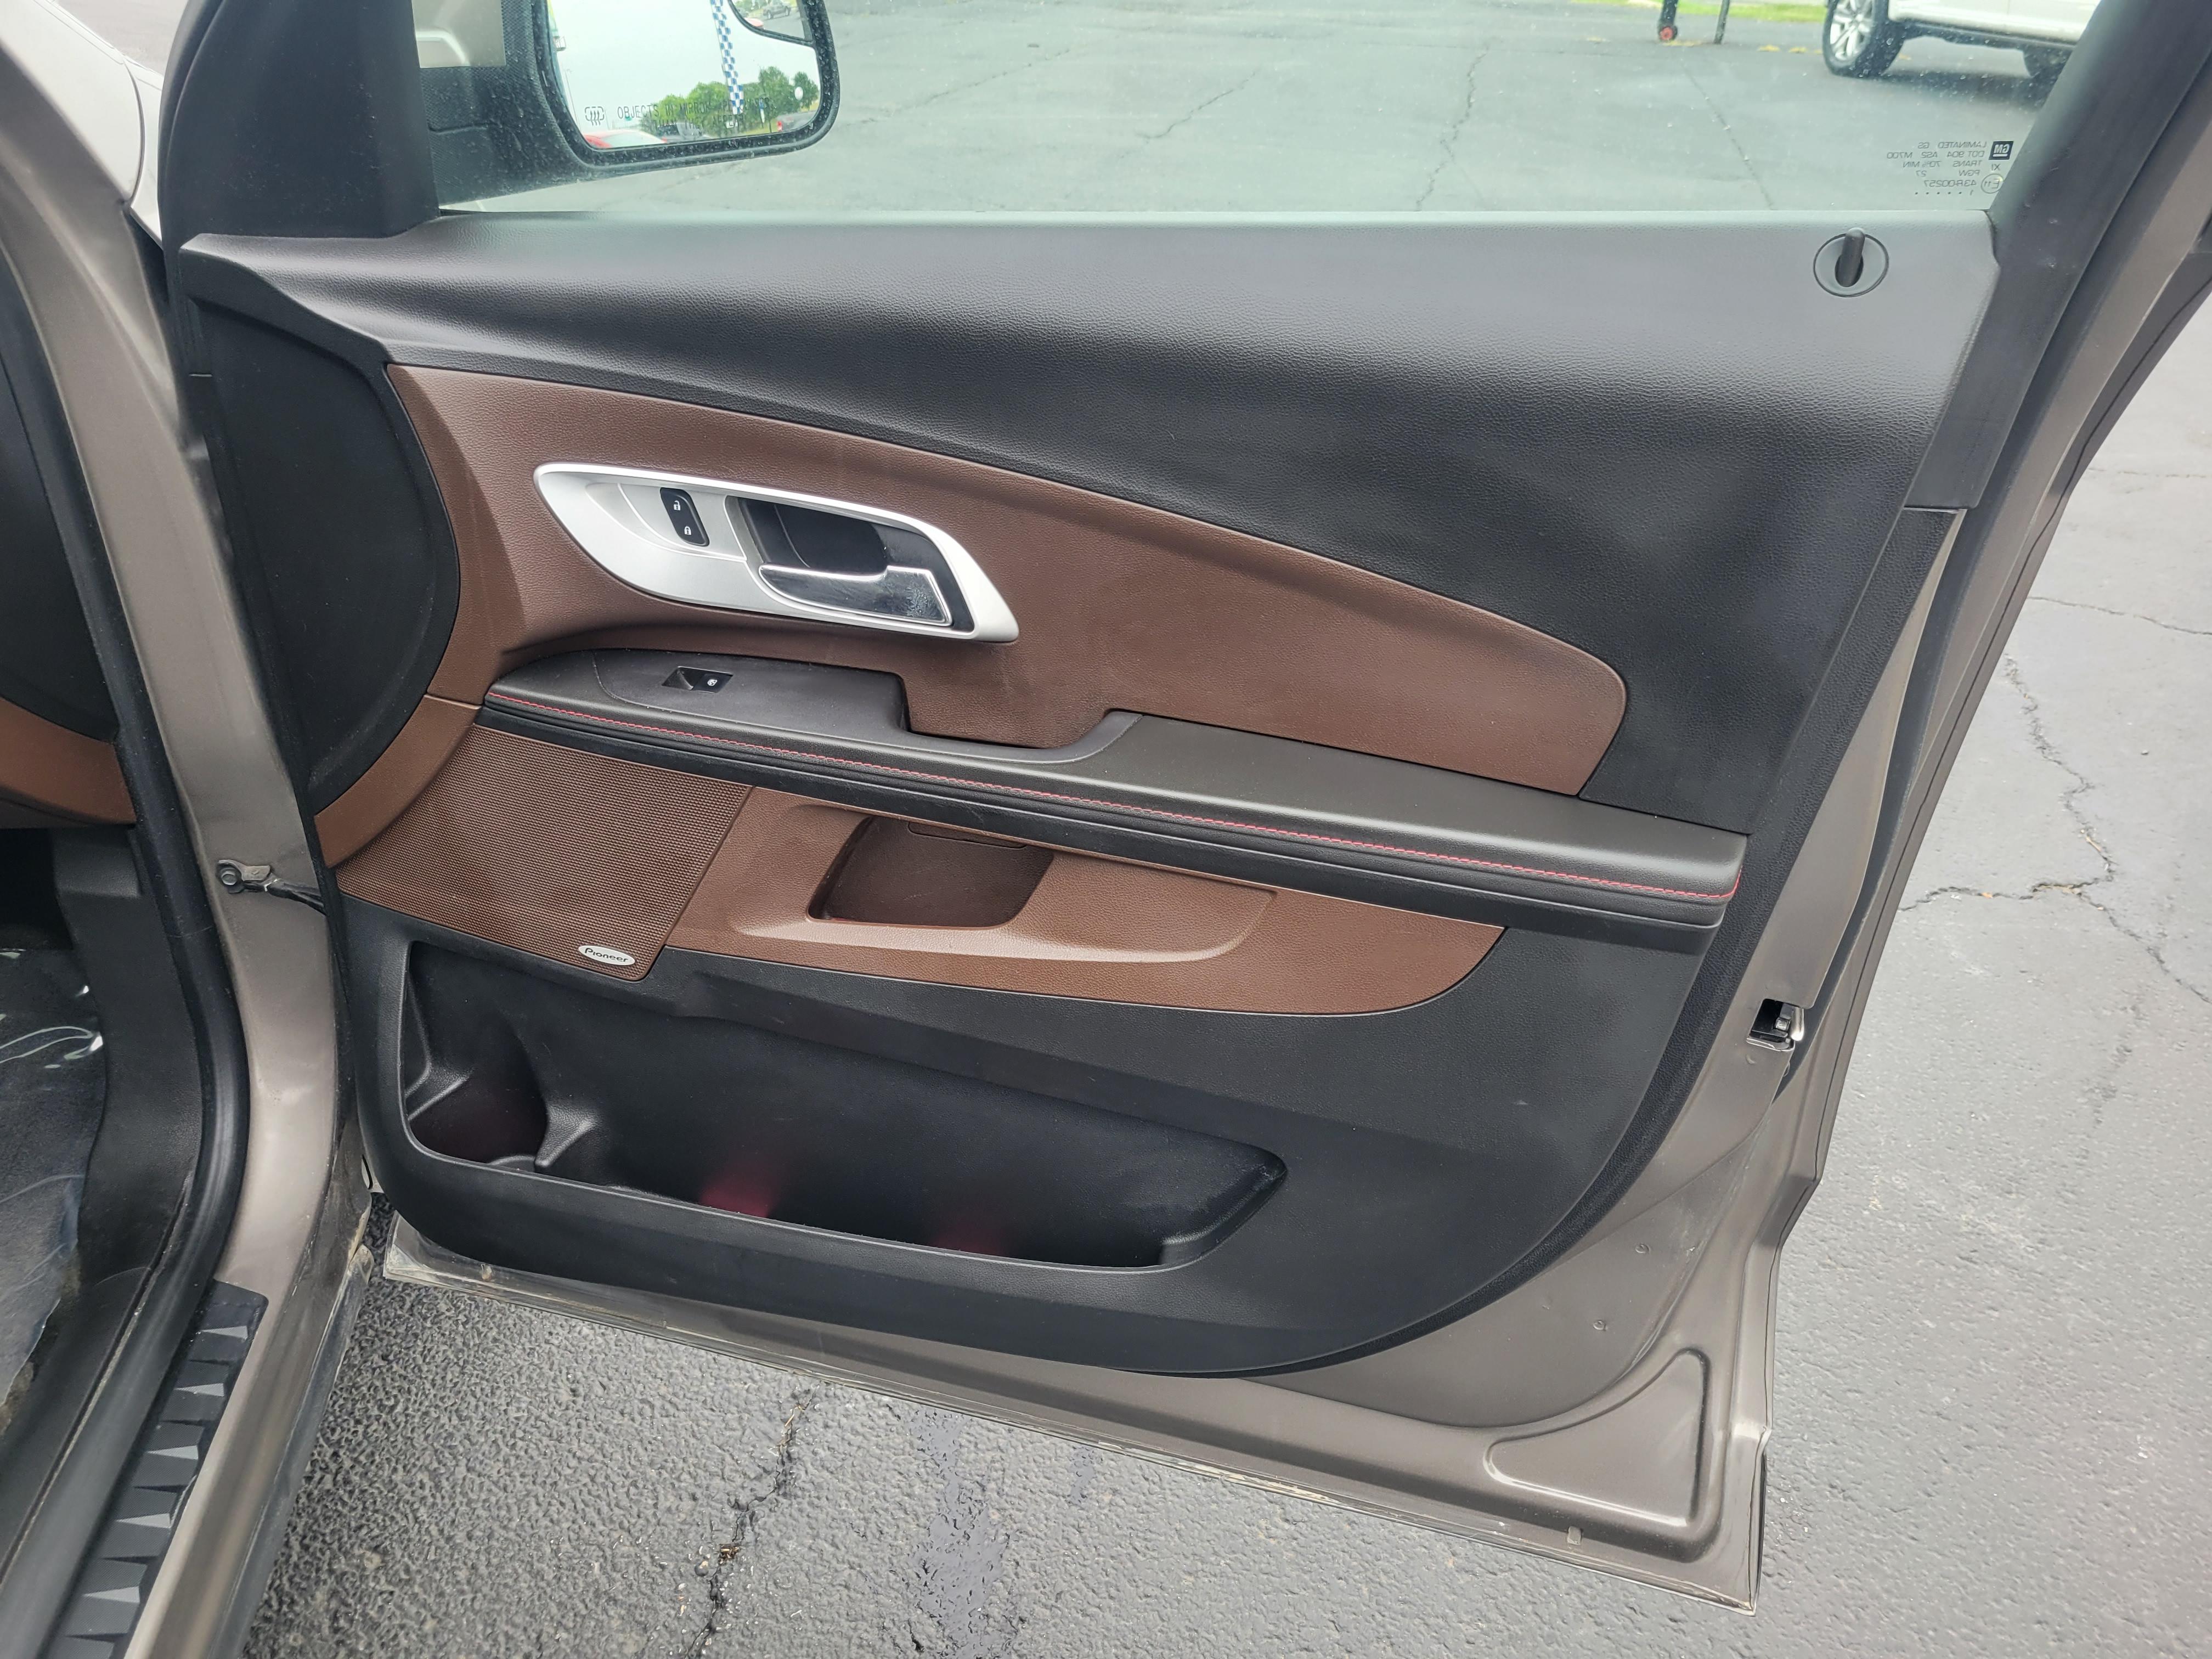 used vehicle - SUV CHEVROLET EQUINOX 2012